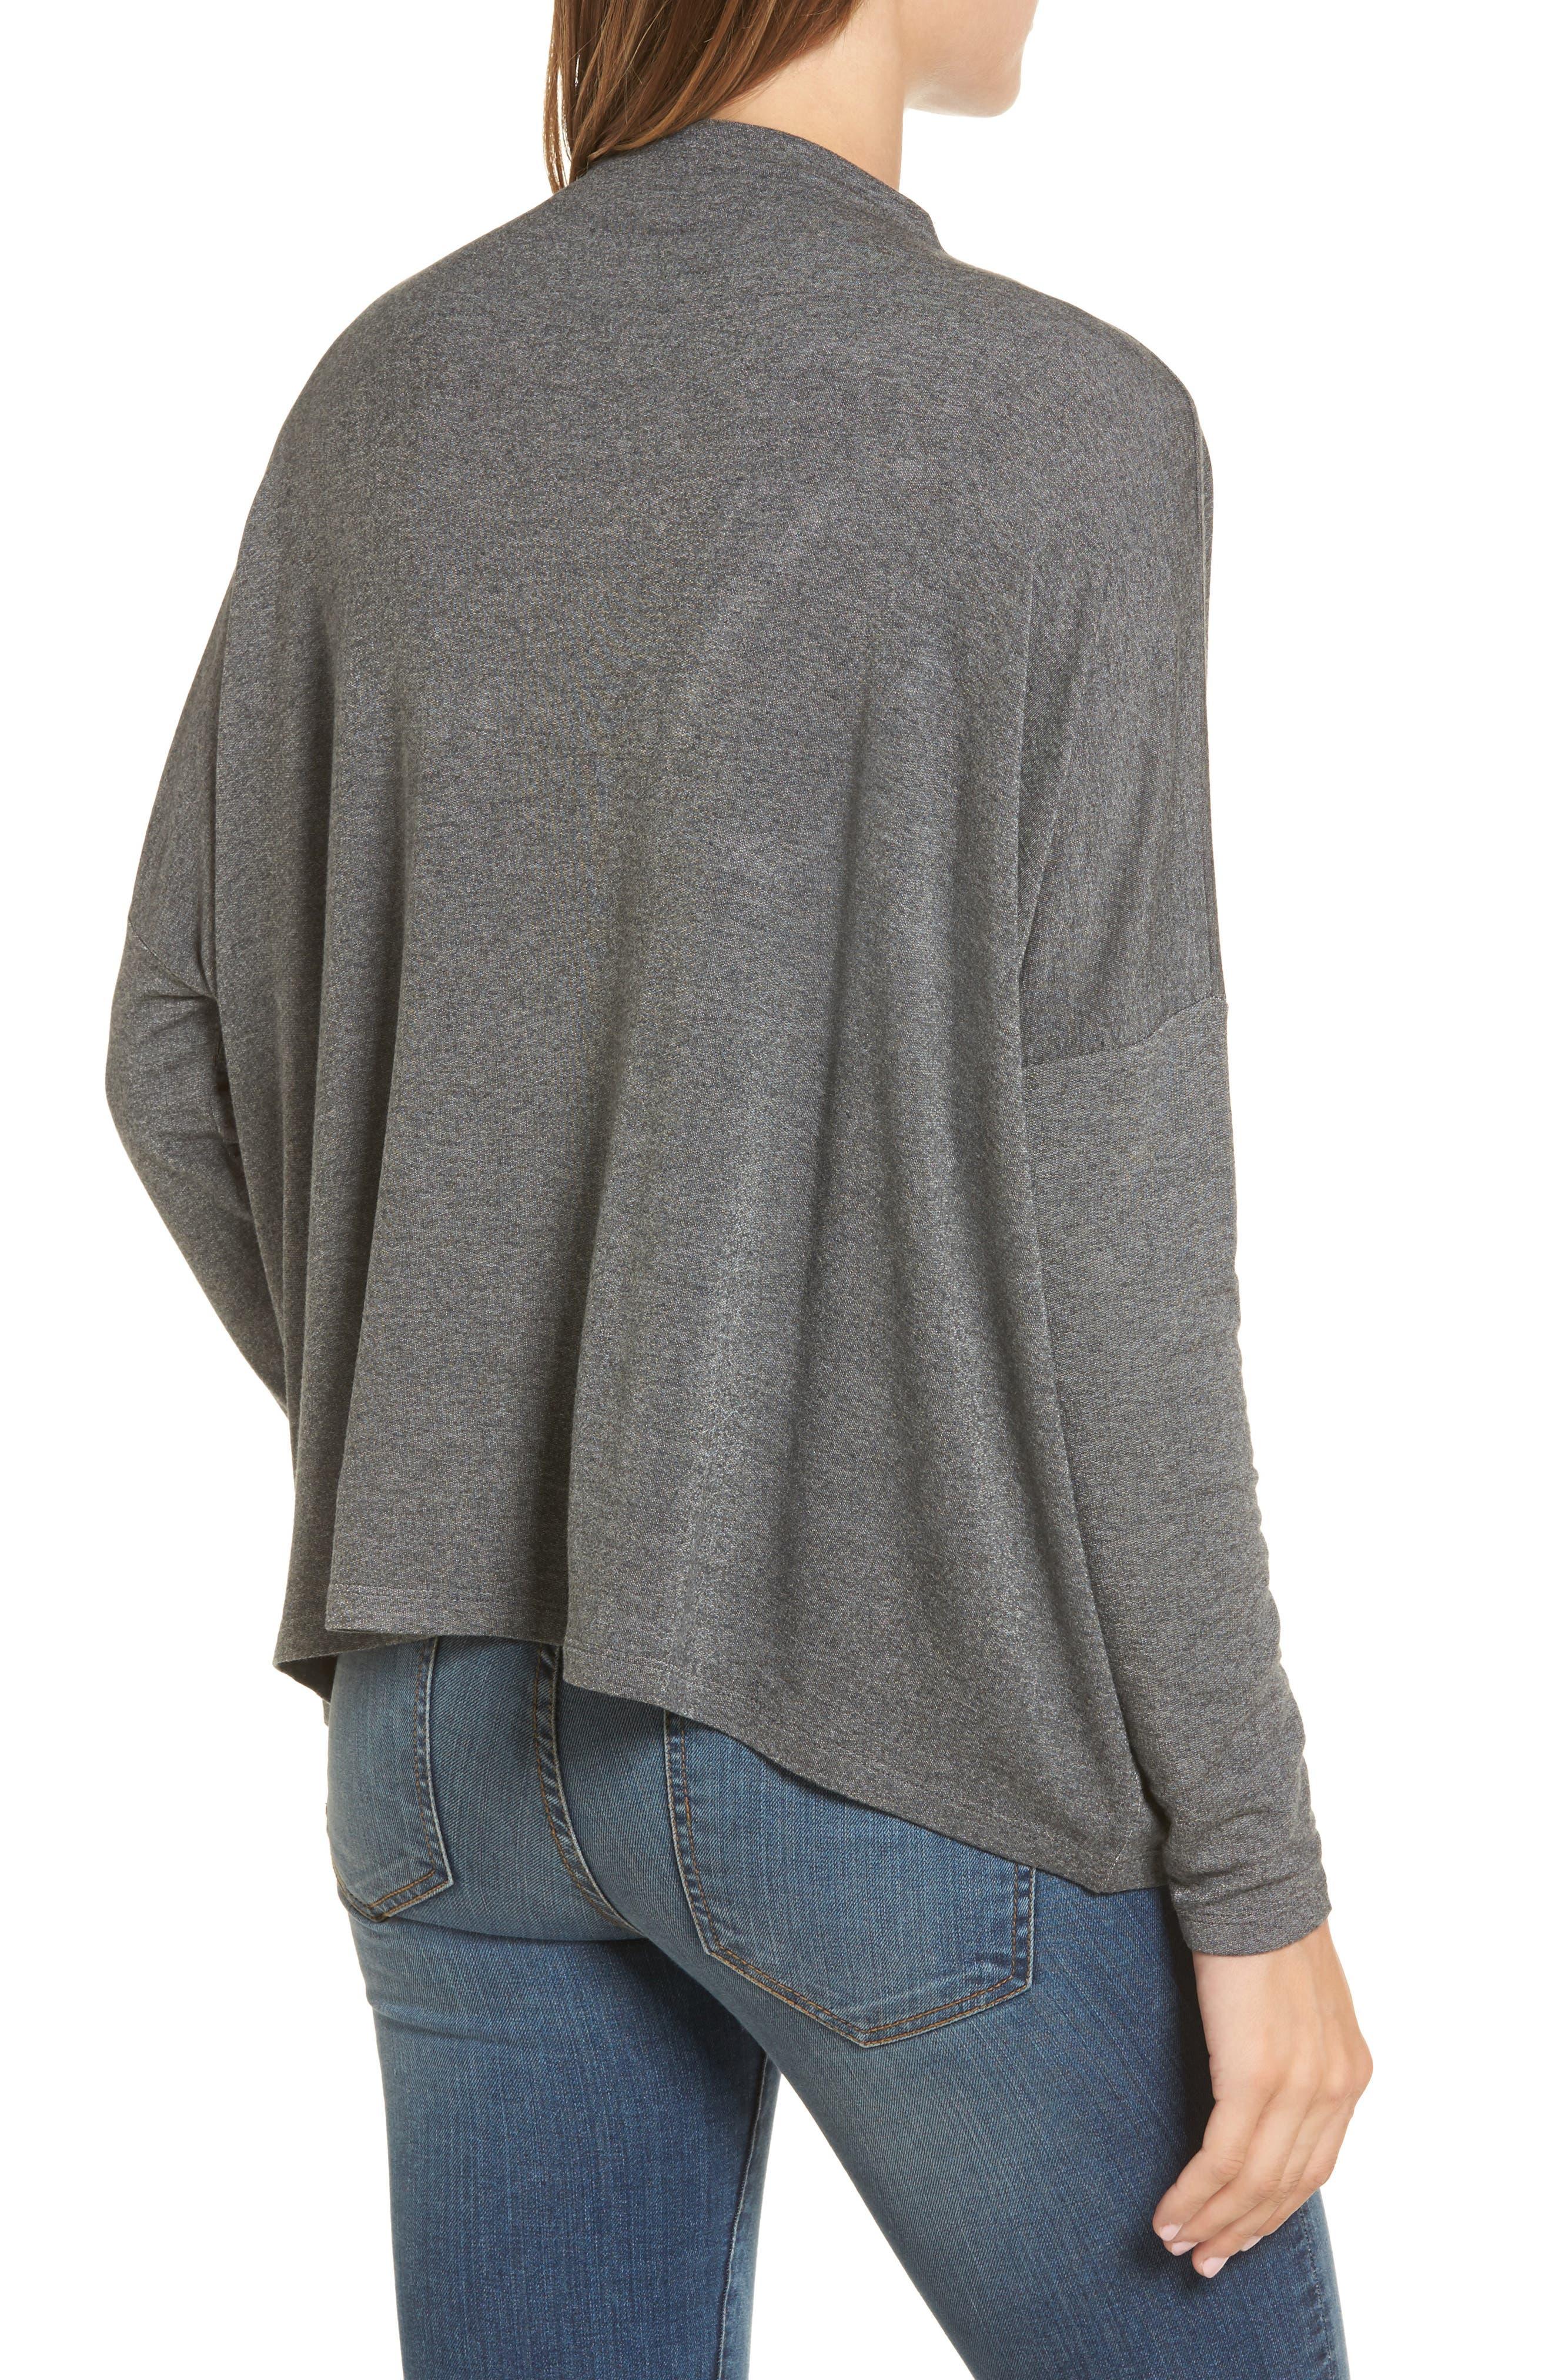 High Neck Sweatshirt,                             Alternate thumbnail 2, color,                             Charcoal Mix